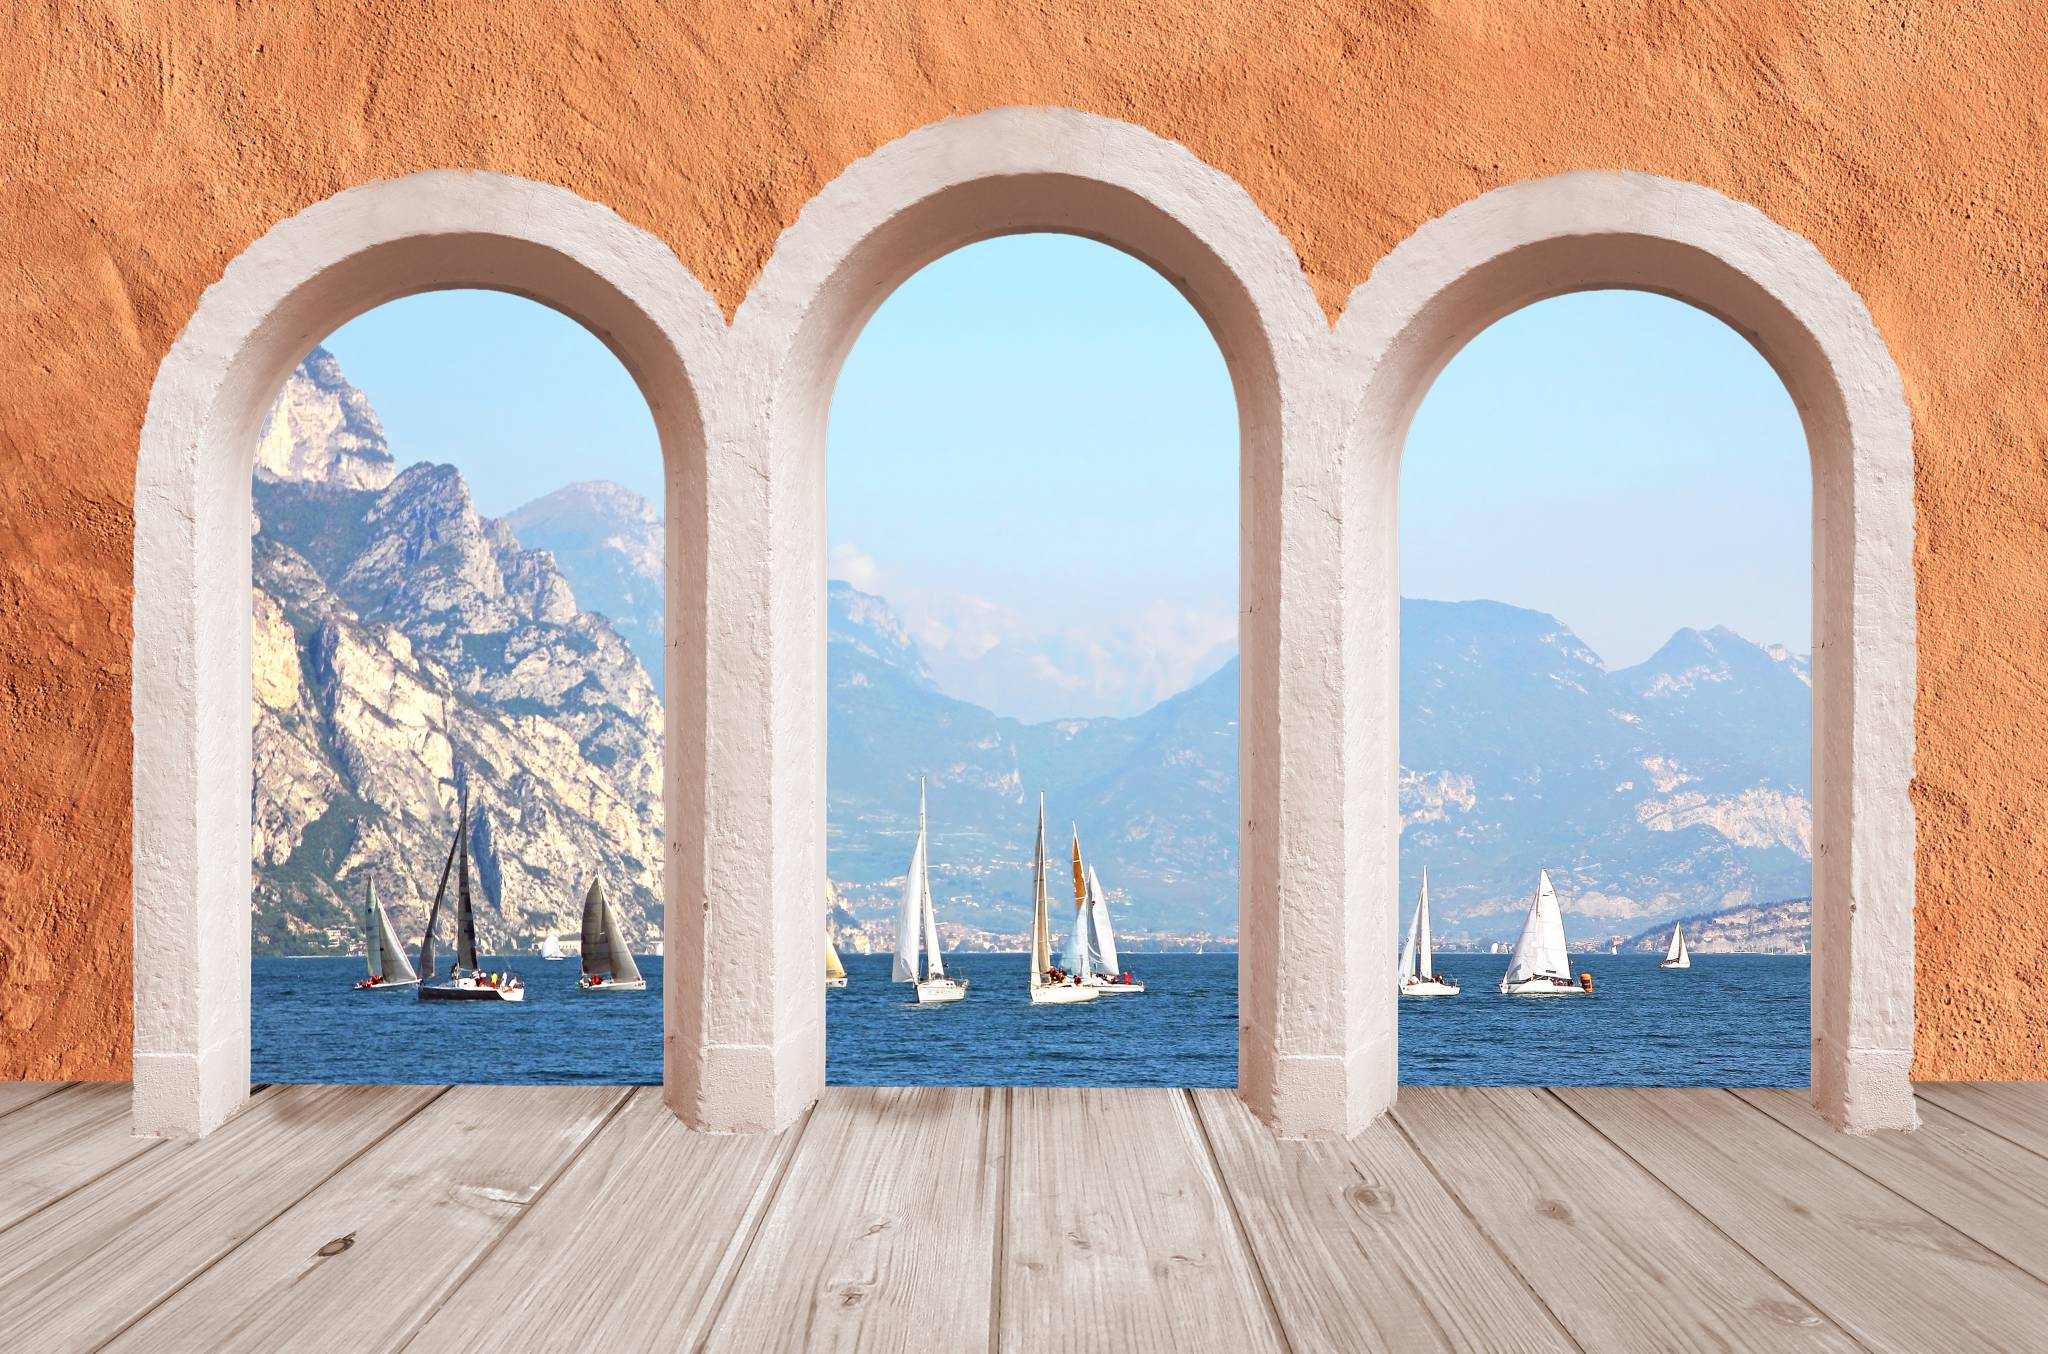 Travel to Lake Garda region with eTips